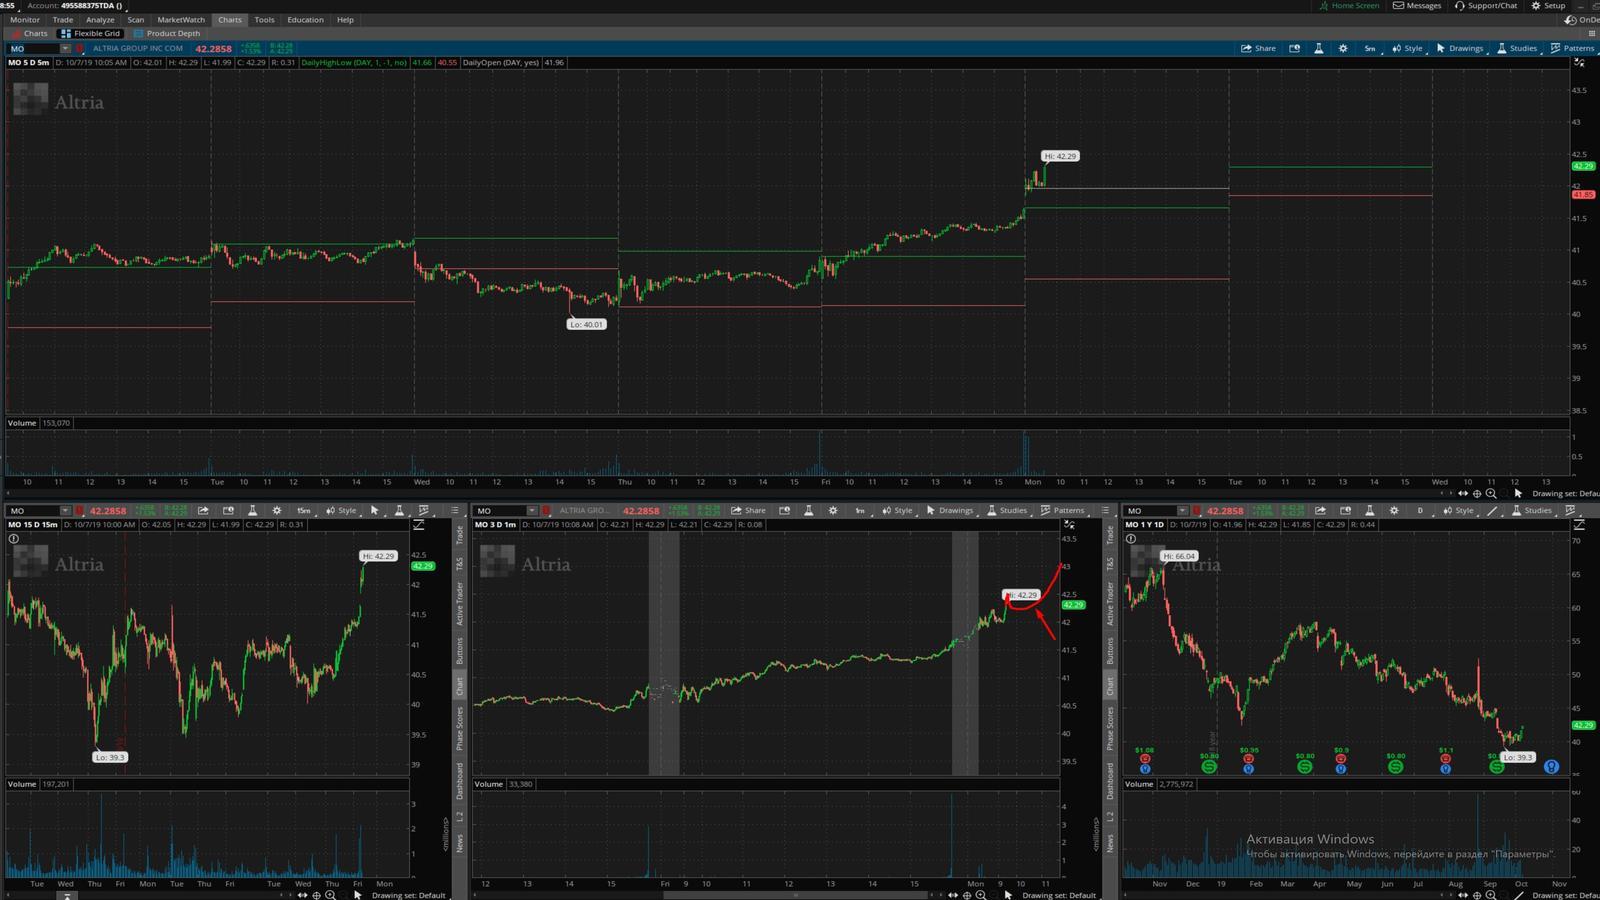 MO - график акции на фондовой бирже